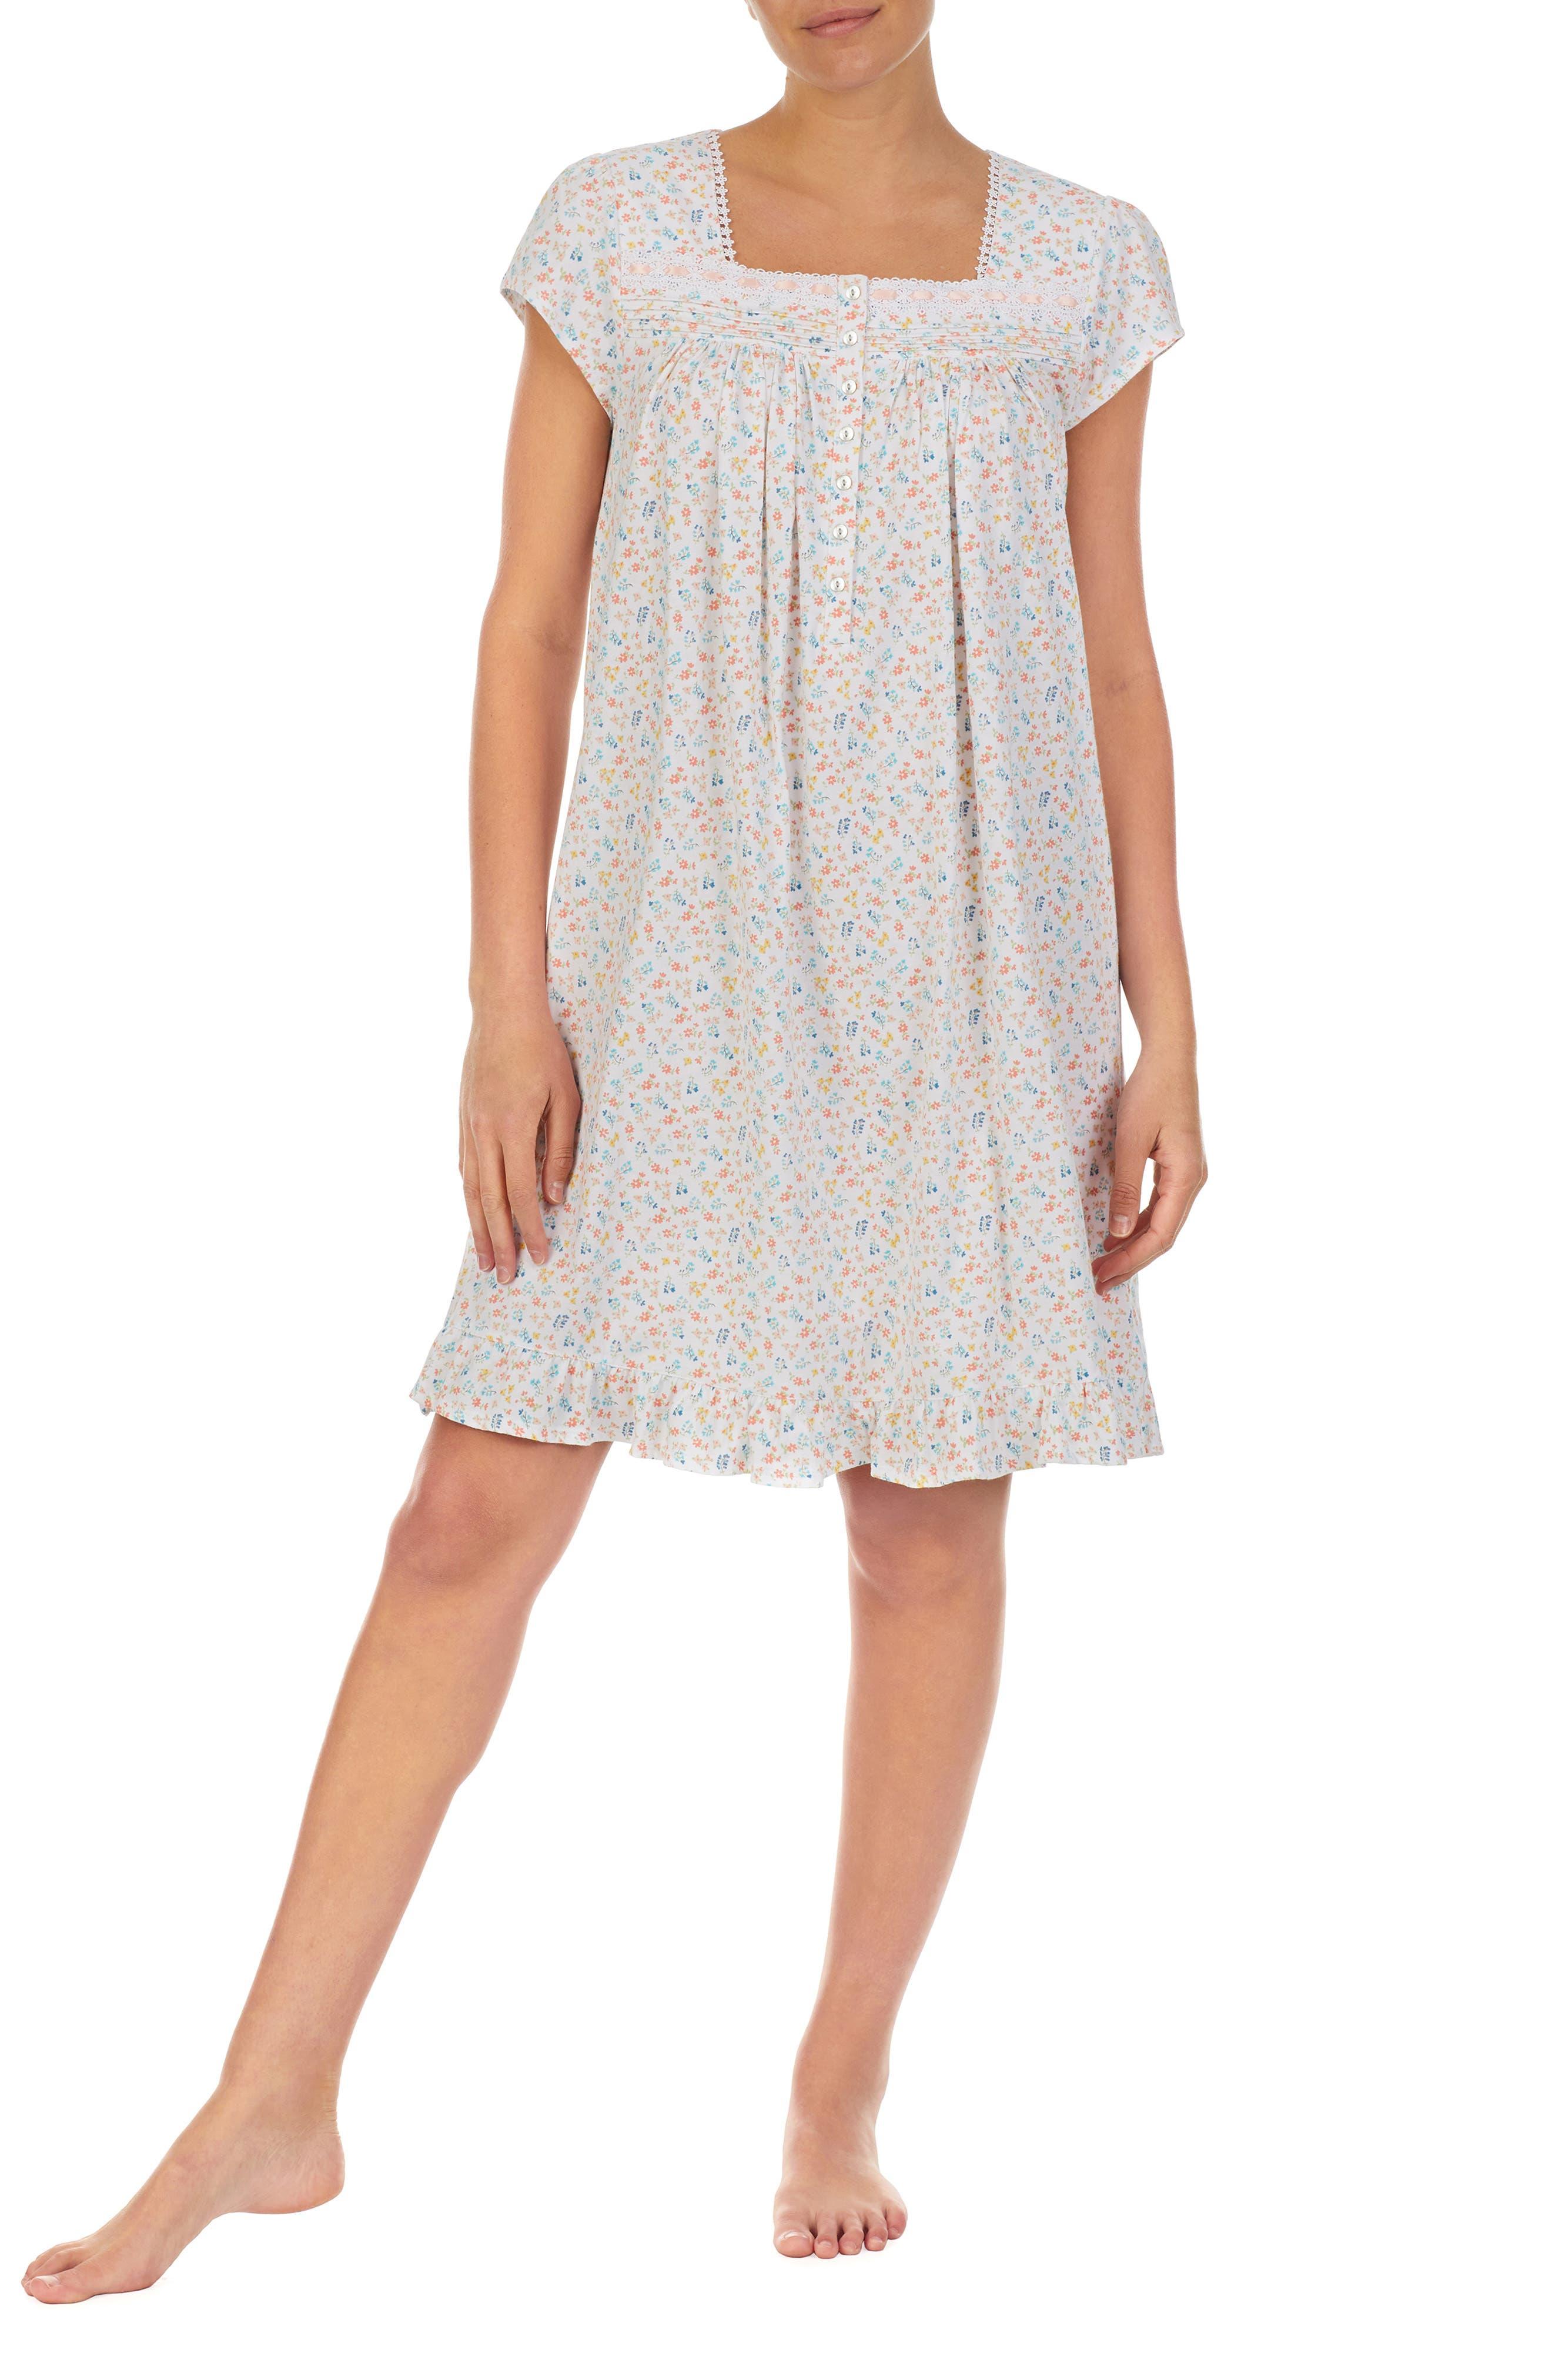 Cap Sleeve Ballet Nightgown